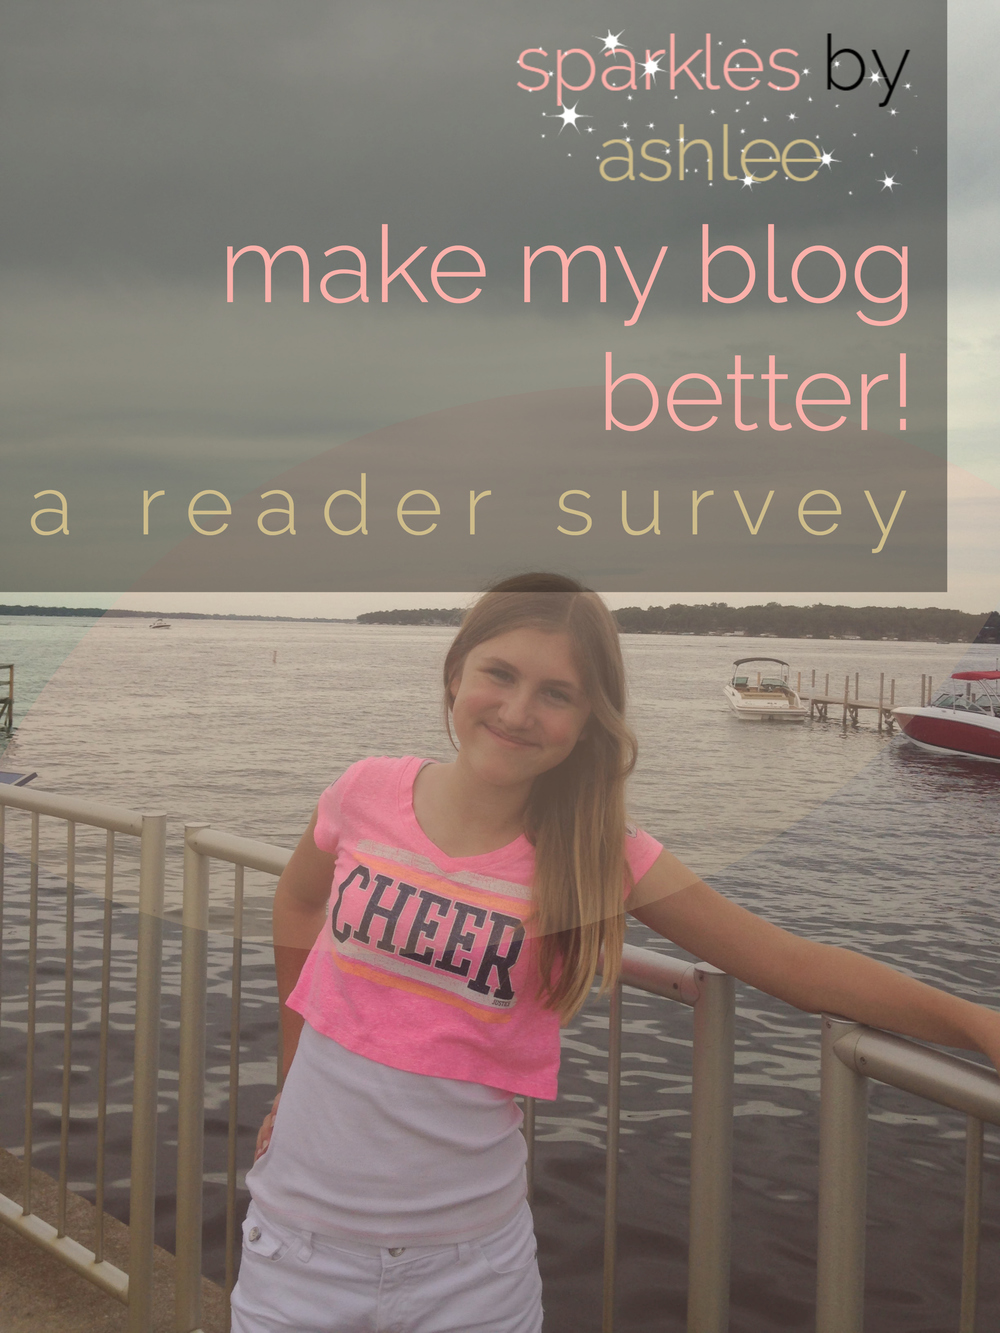 Make-My-Blog-Better-Sparkles-by-Ashlee.jpg